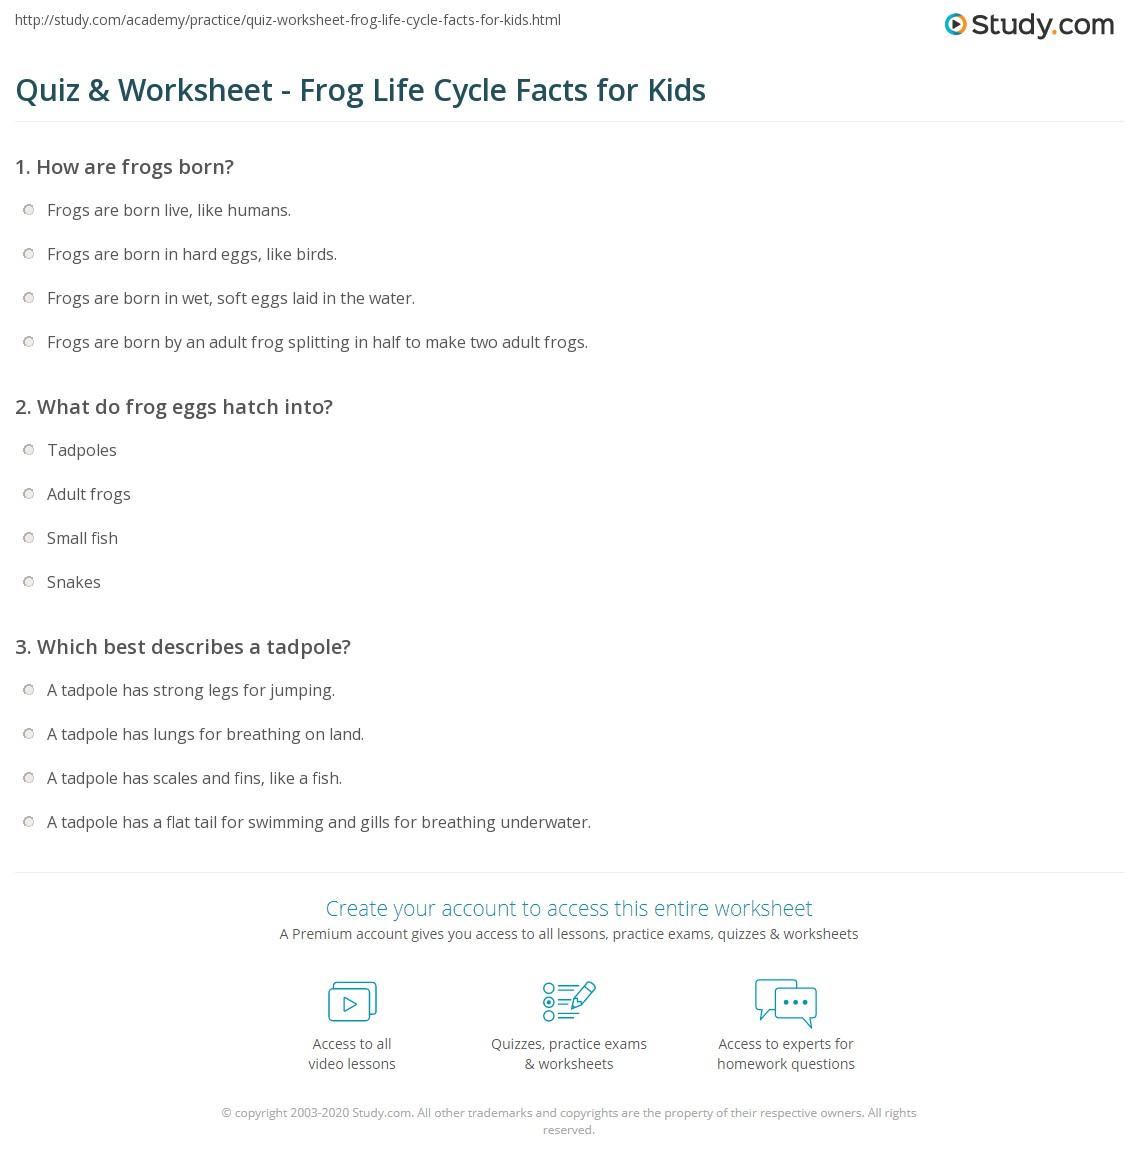 Worksheets Frog Life Cycle Worksheet quiz worksheet frog life cycle facts for kids study com print lesson worksheet